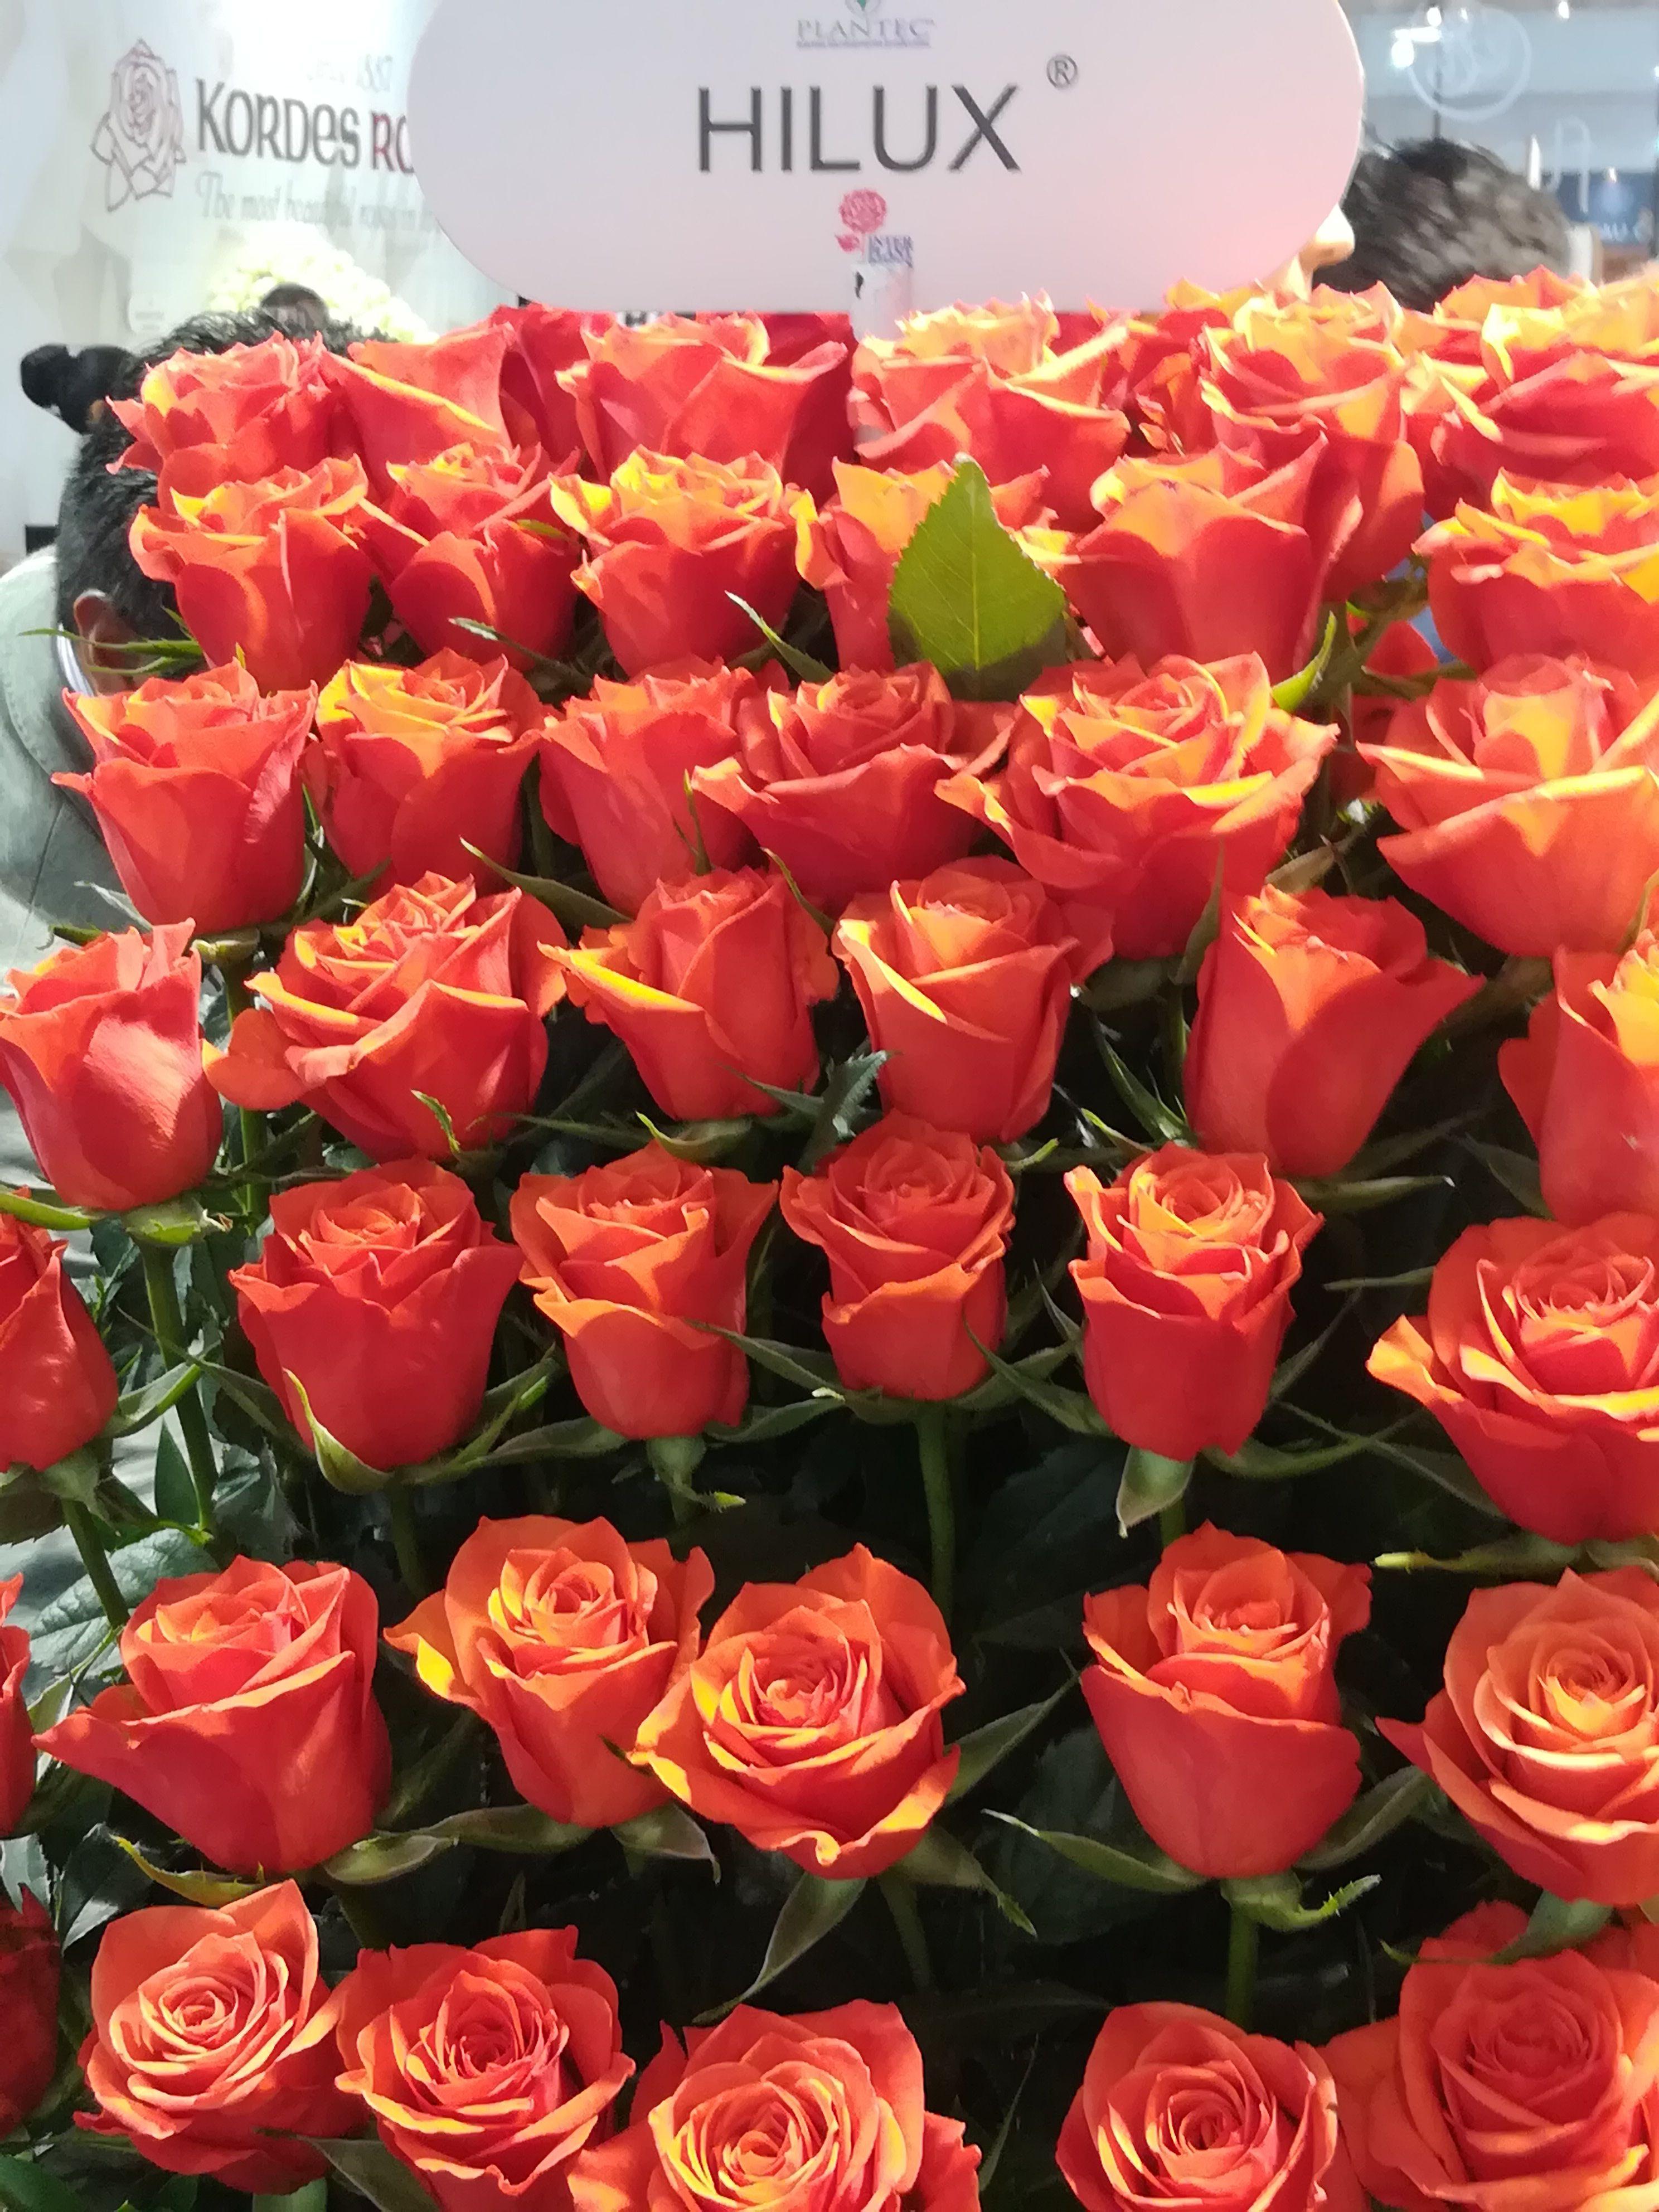 Where to Buy Bulk Flowers Online for Your Wedding  Roses Flowers